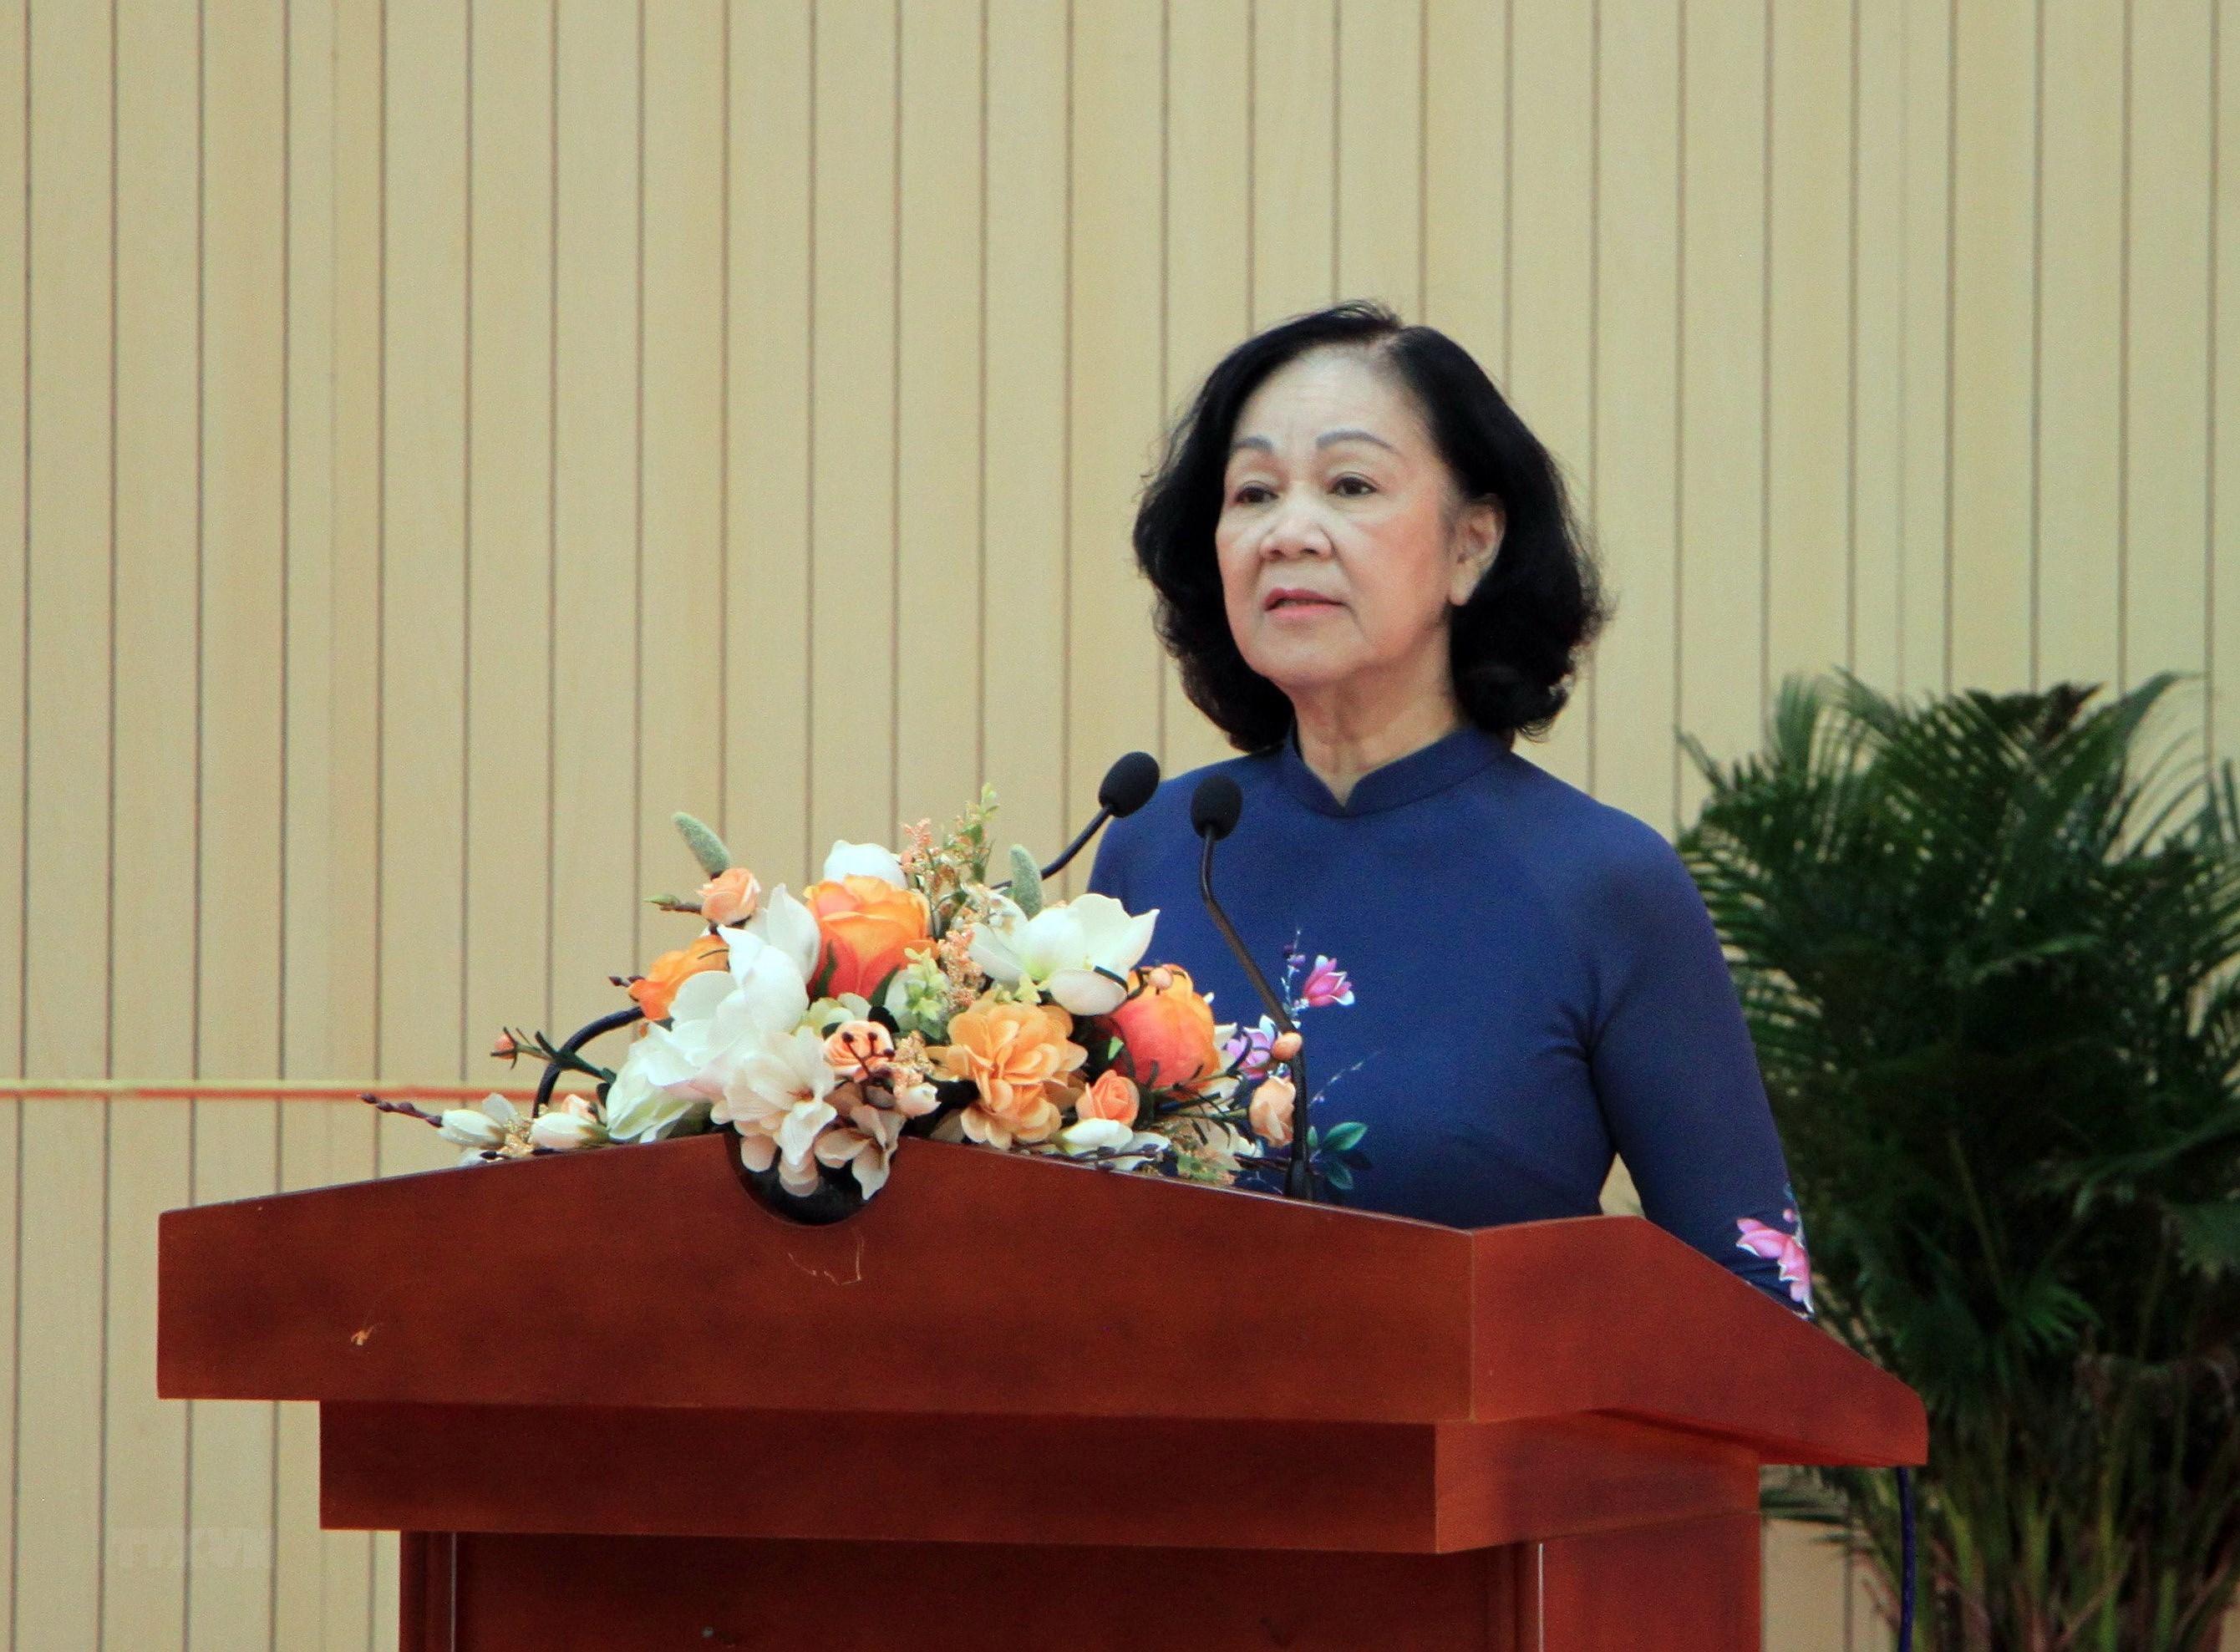 Ong Nguyen Manh Cuong giu chuc Bi thu Tinh uy Binh Phuoc hinh anh 1